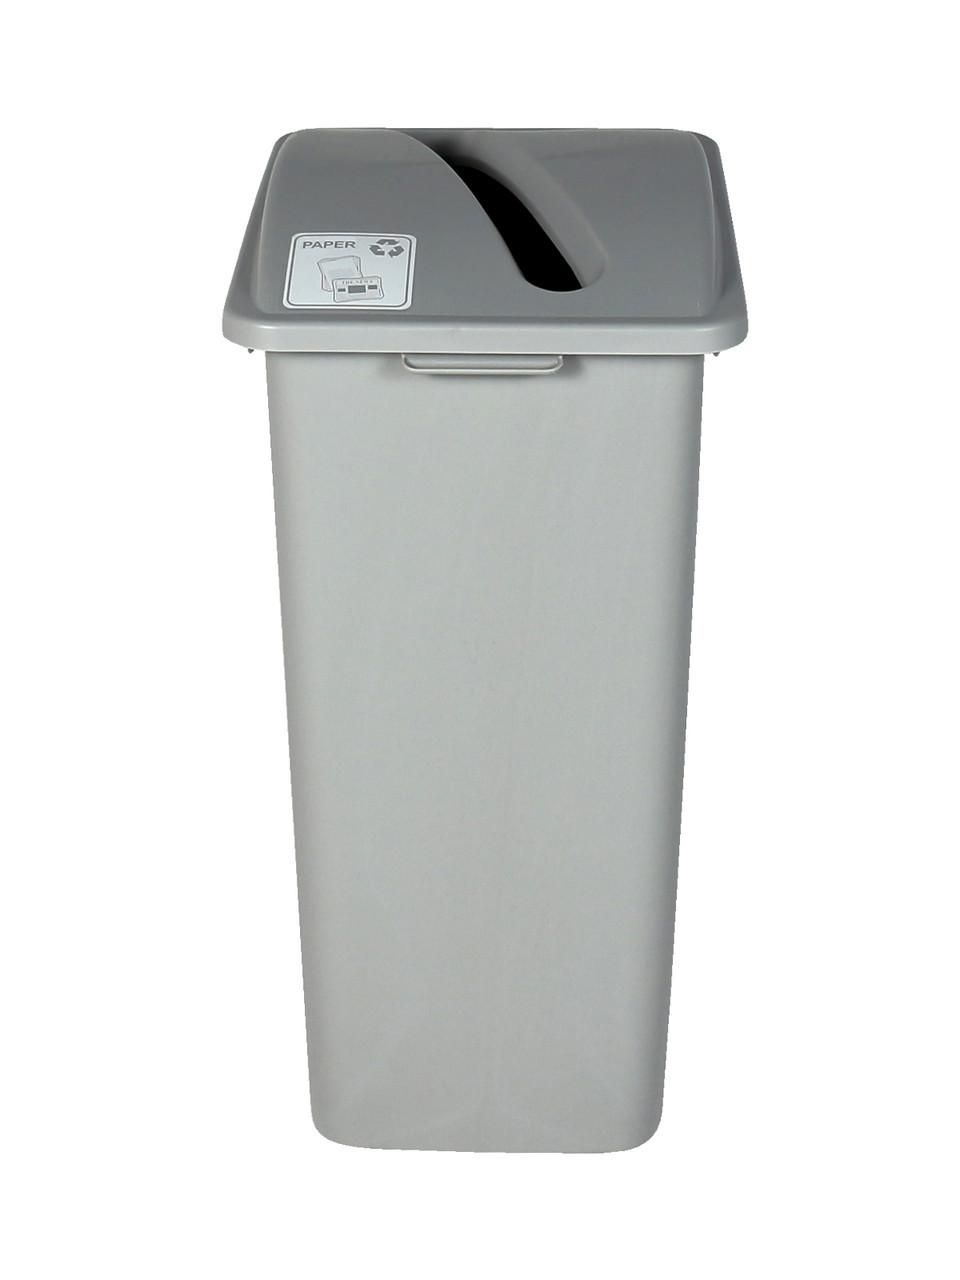 32 Gallon XL Simple Sort Recycling Bin Gray